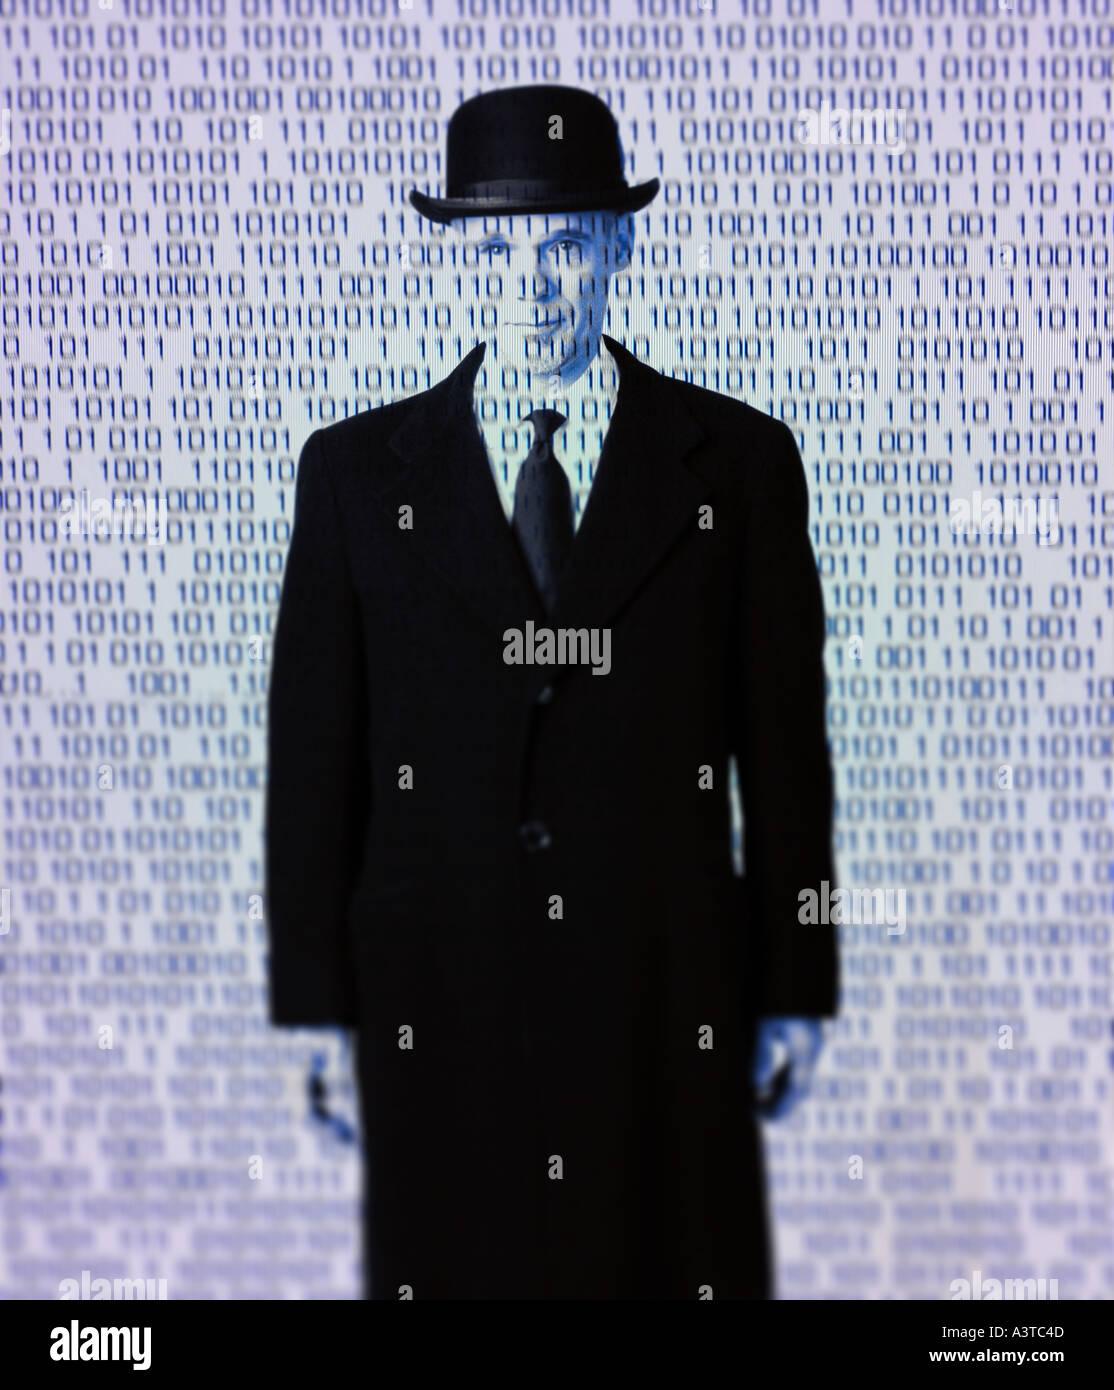 Hombre con sombrero con información del equipo de código binario como Rene Magritte estilo homenaje equipo concepto de robot Imagen De Stock